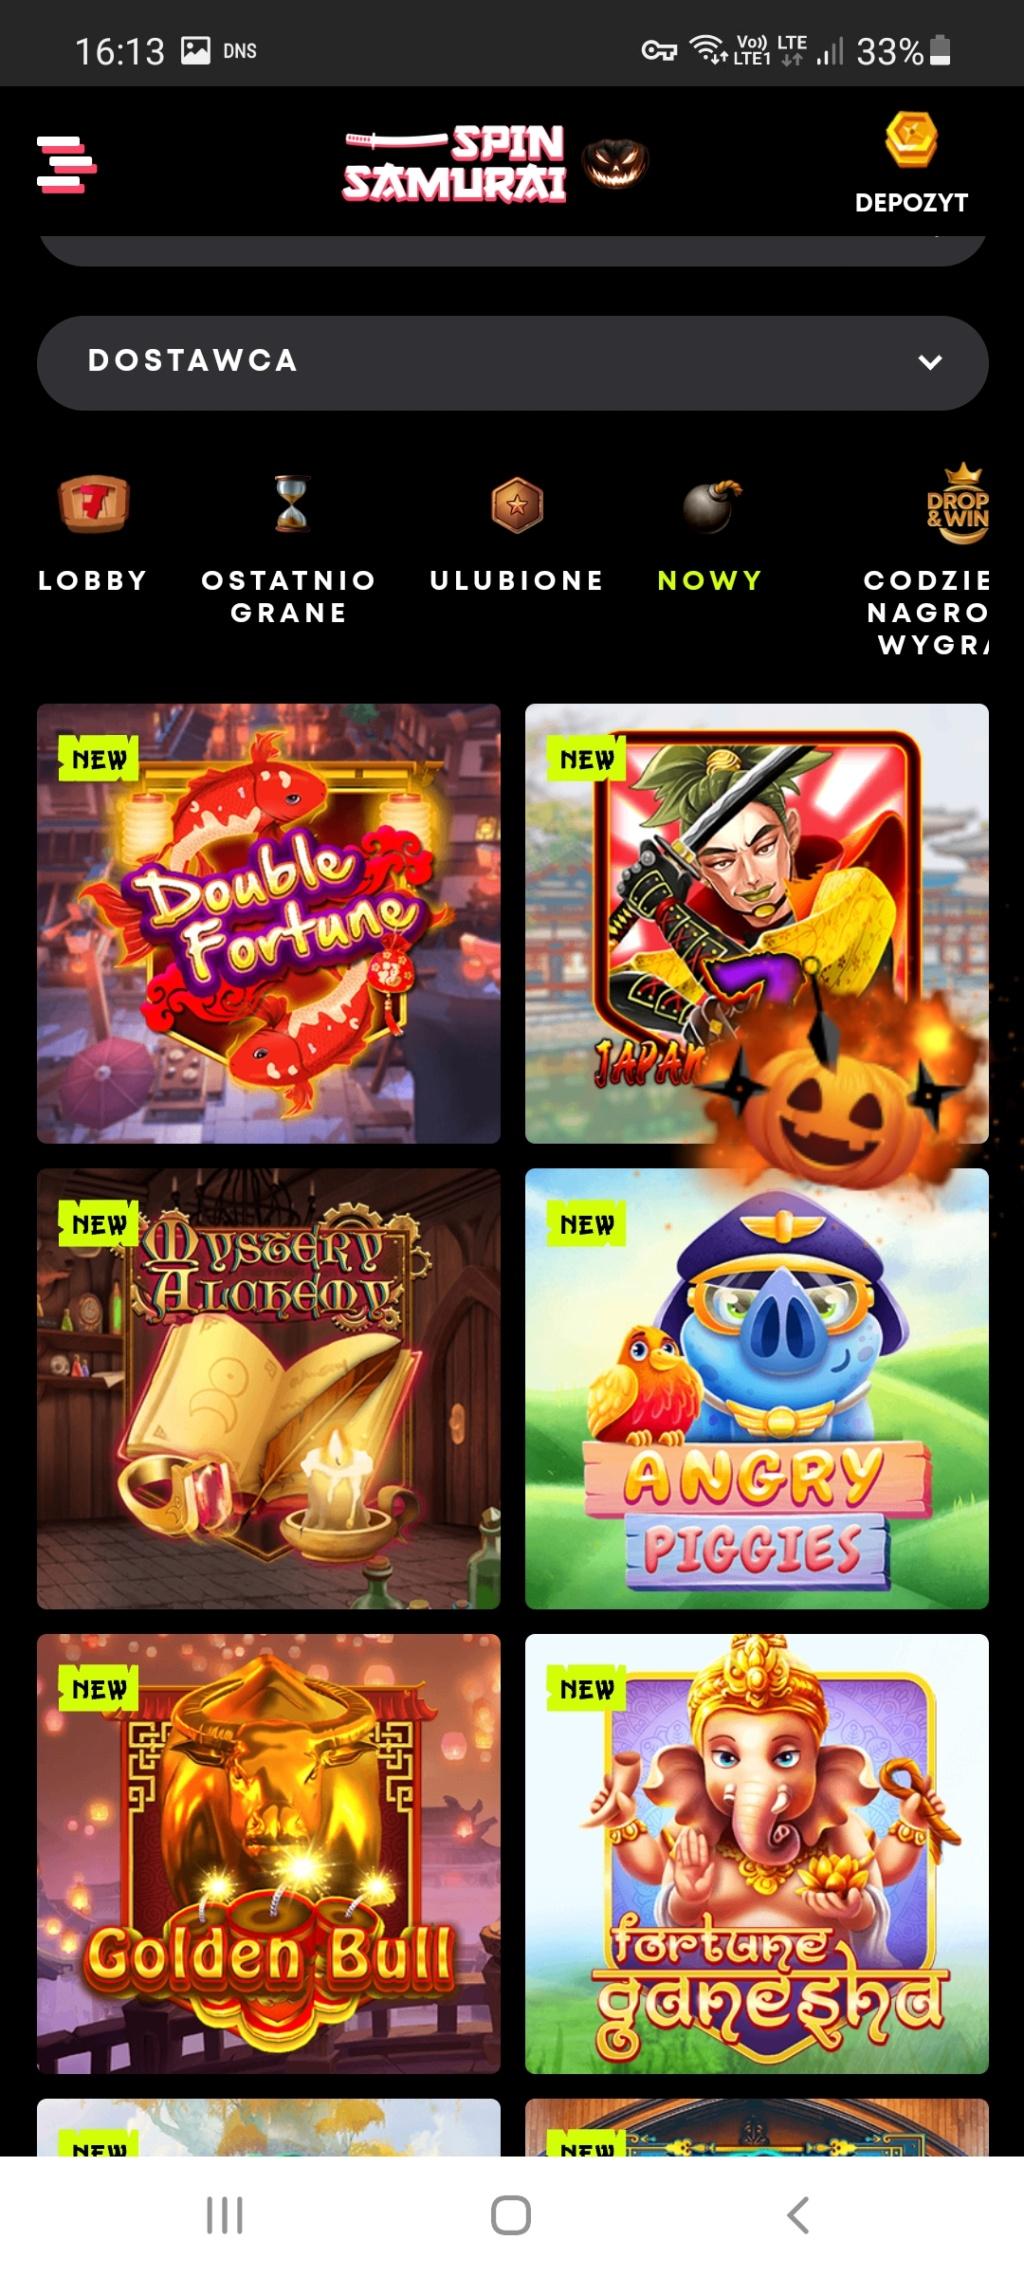 Spin Samurai kasyno online 20 darmowych spinów bez depozytu (exclusive) - Page 2 Screen28